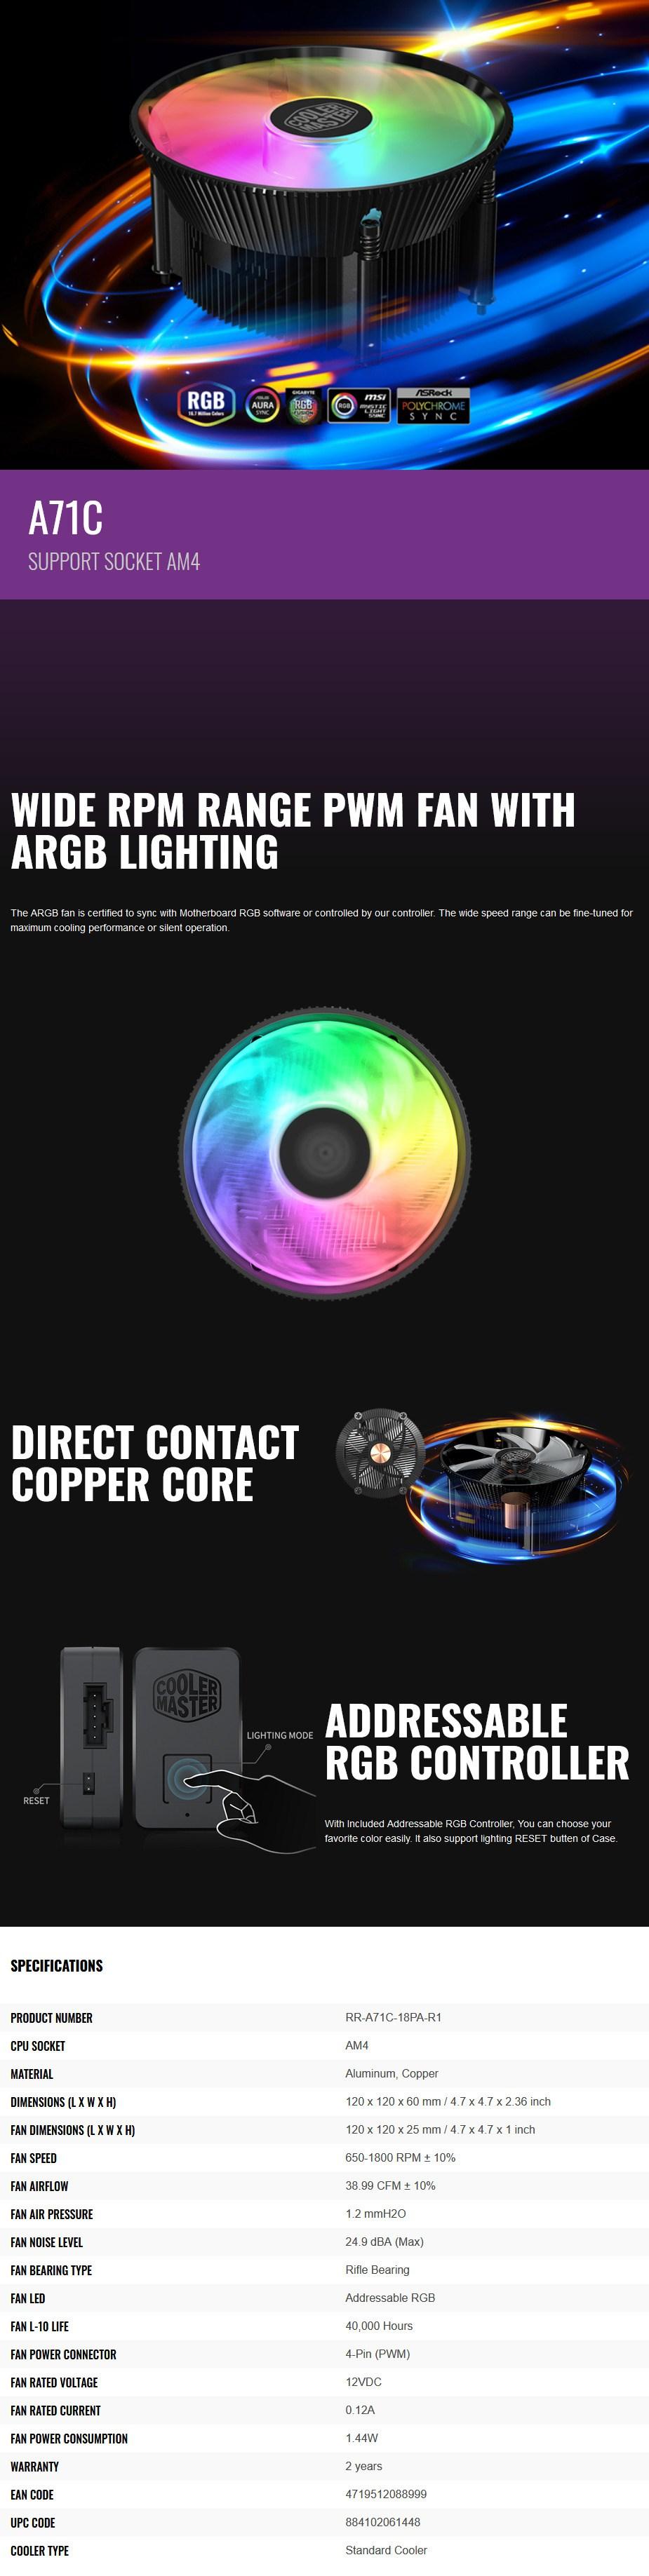 cooler-master-a71c-argb-am4-cpu-air-cooler-ac35515-6.jpg